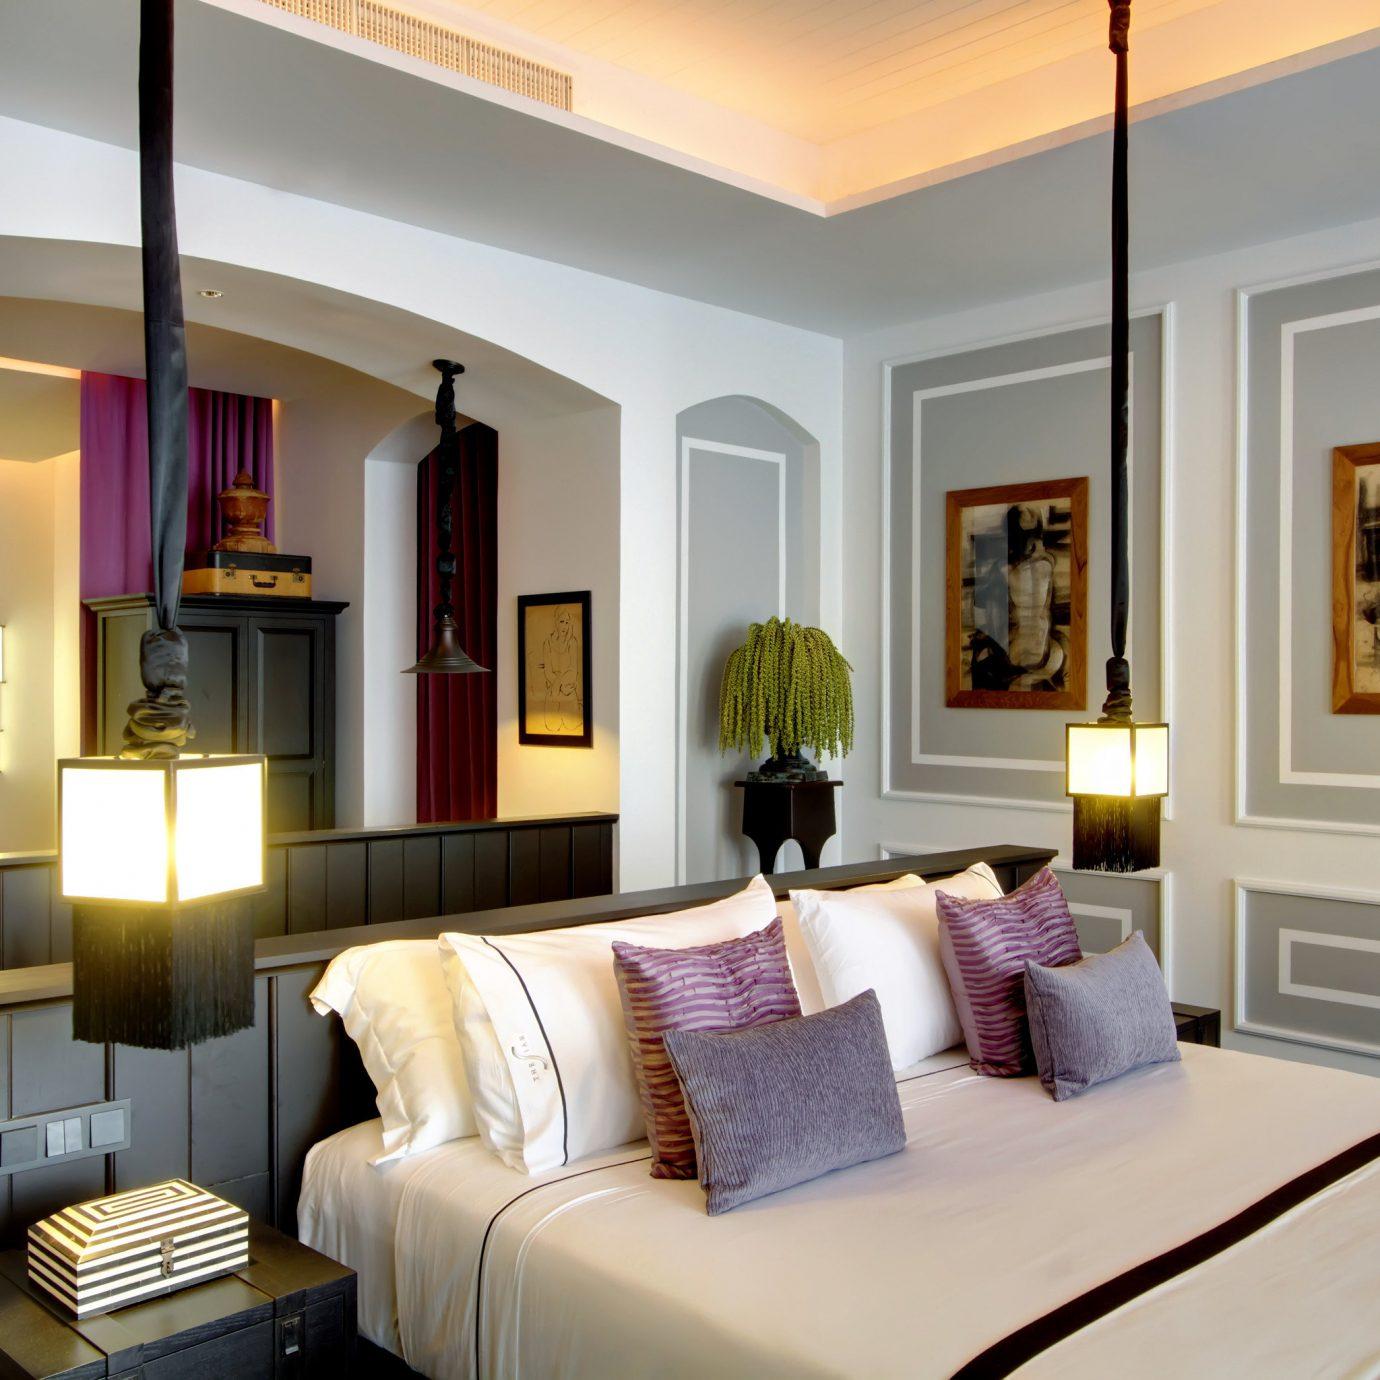 Bedroom City Honeymoon Luxury Romance Romantic sofa living room property home Suite flat Modern